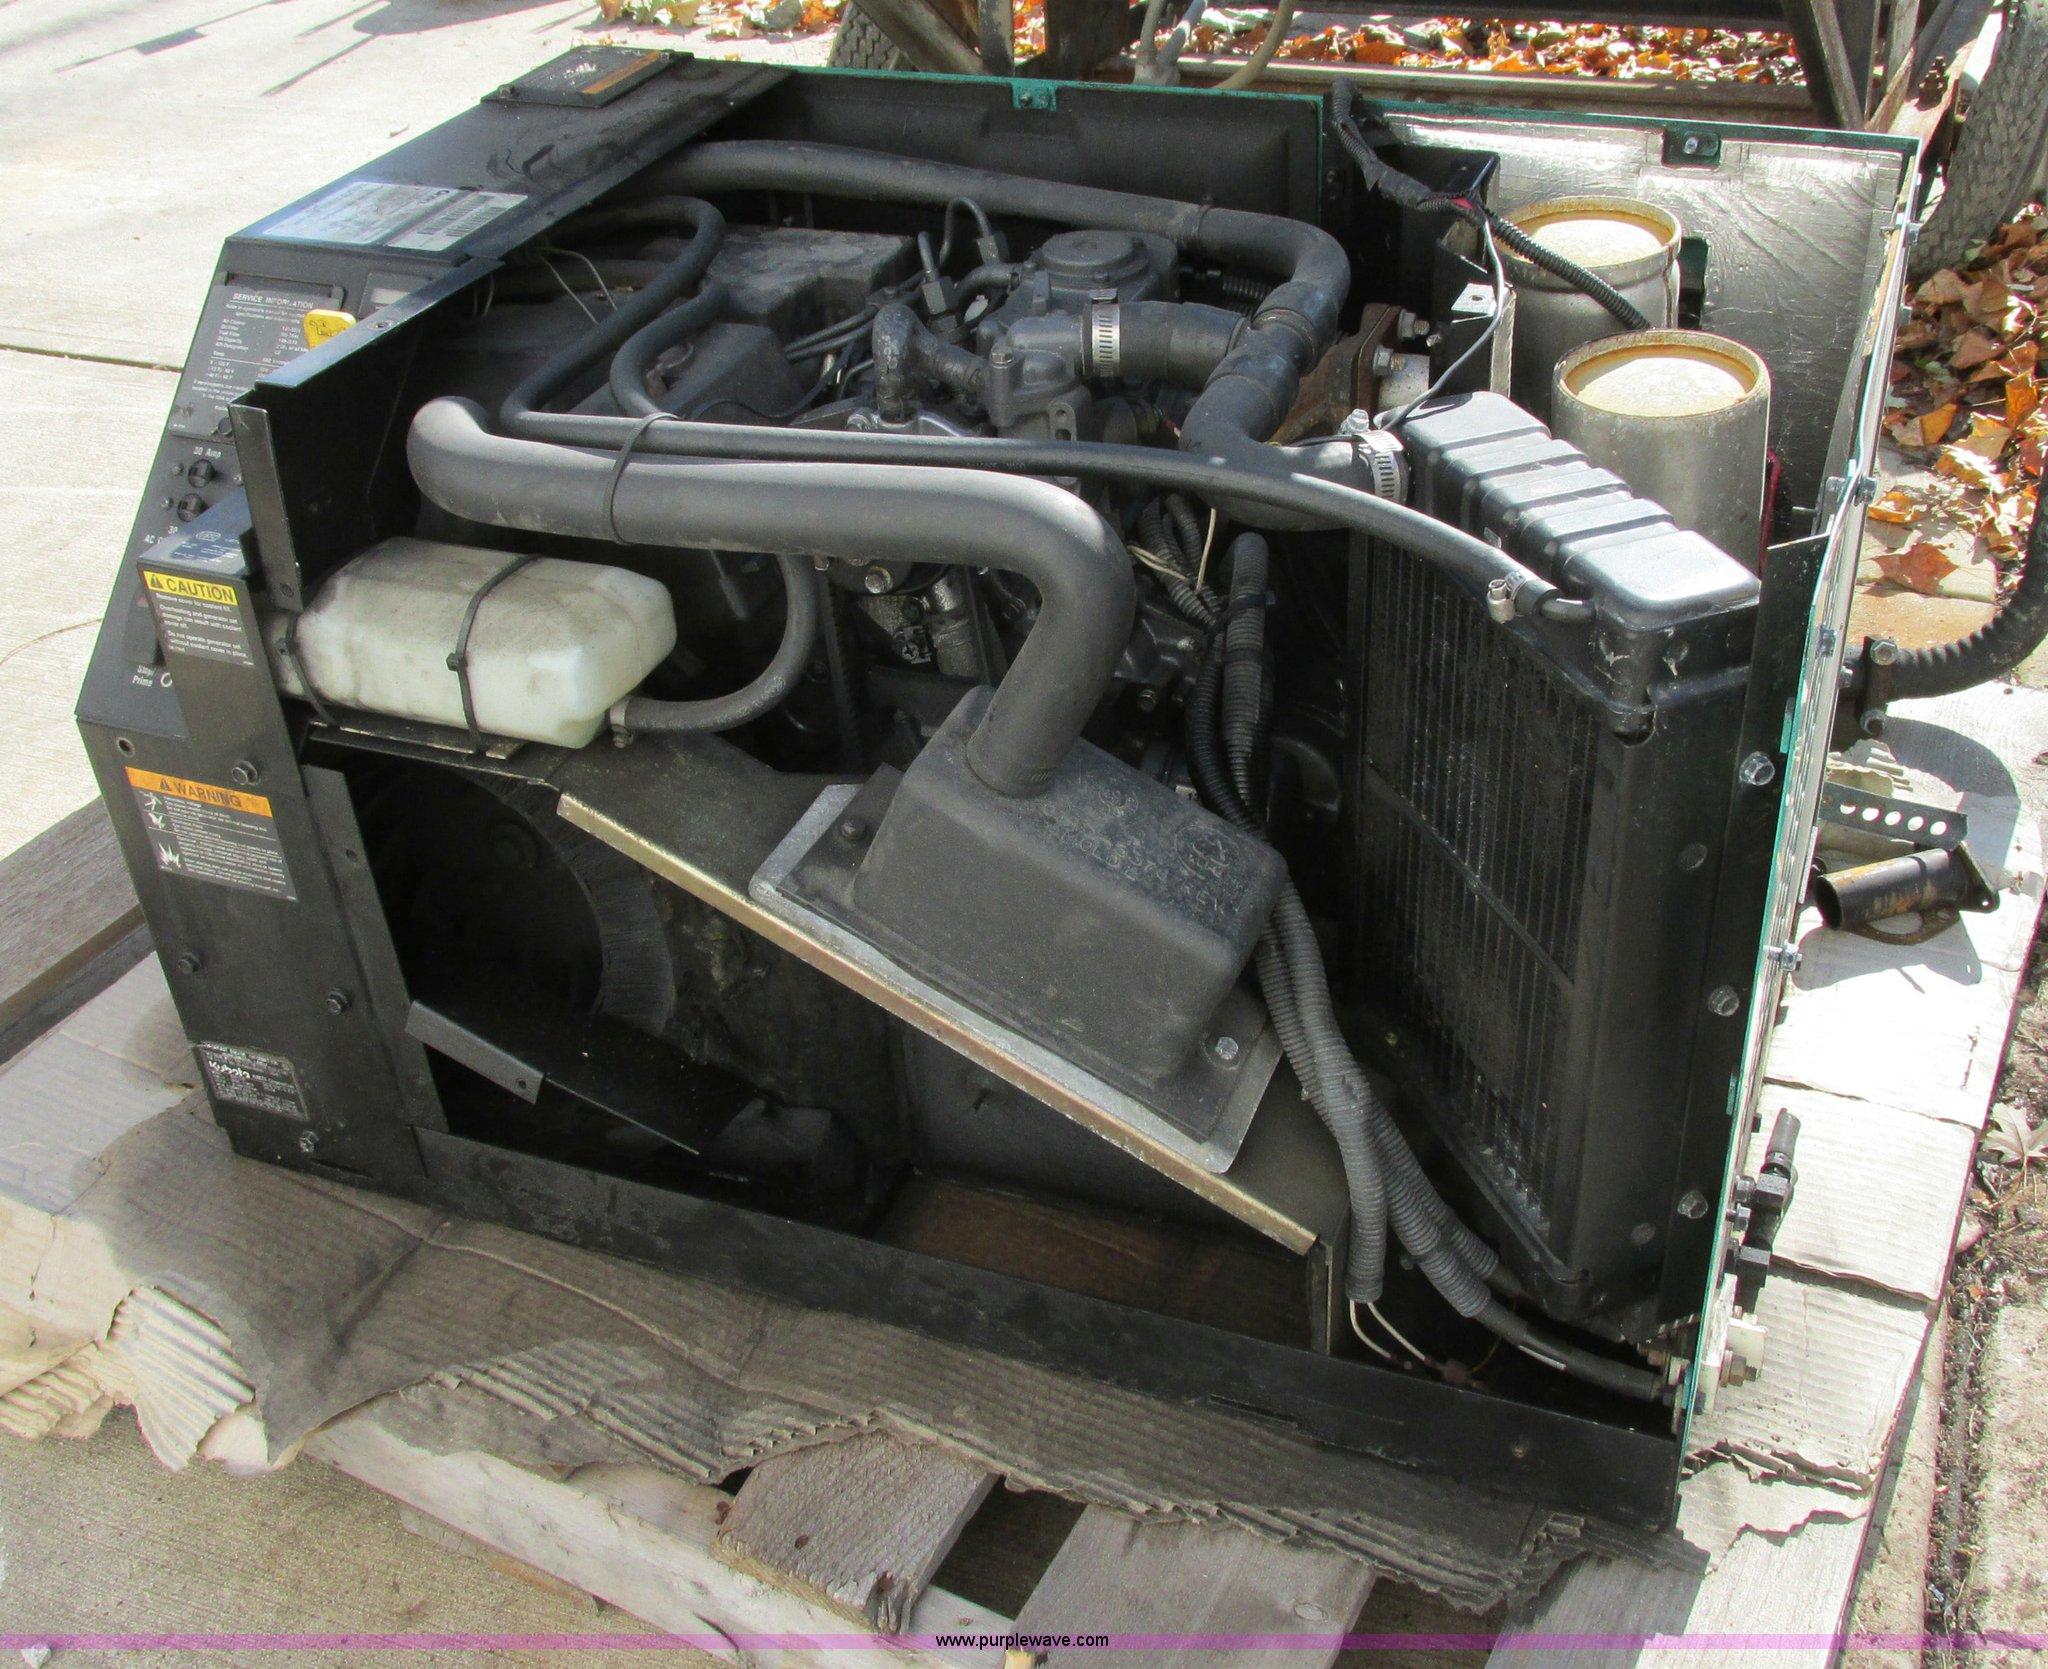 an Quiet 5500 generator Item F5397